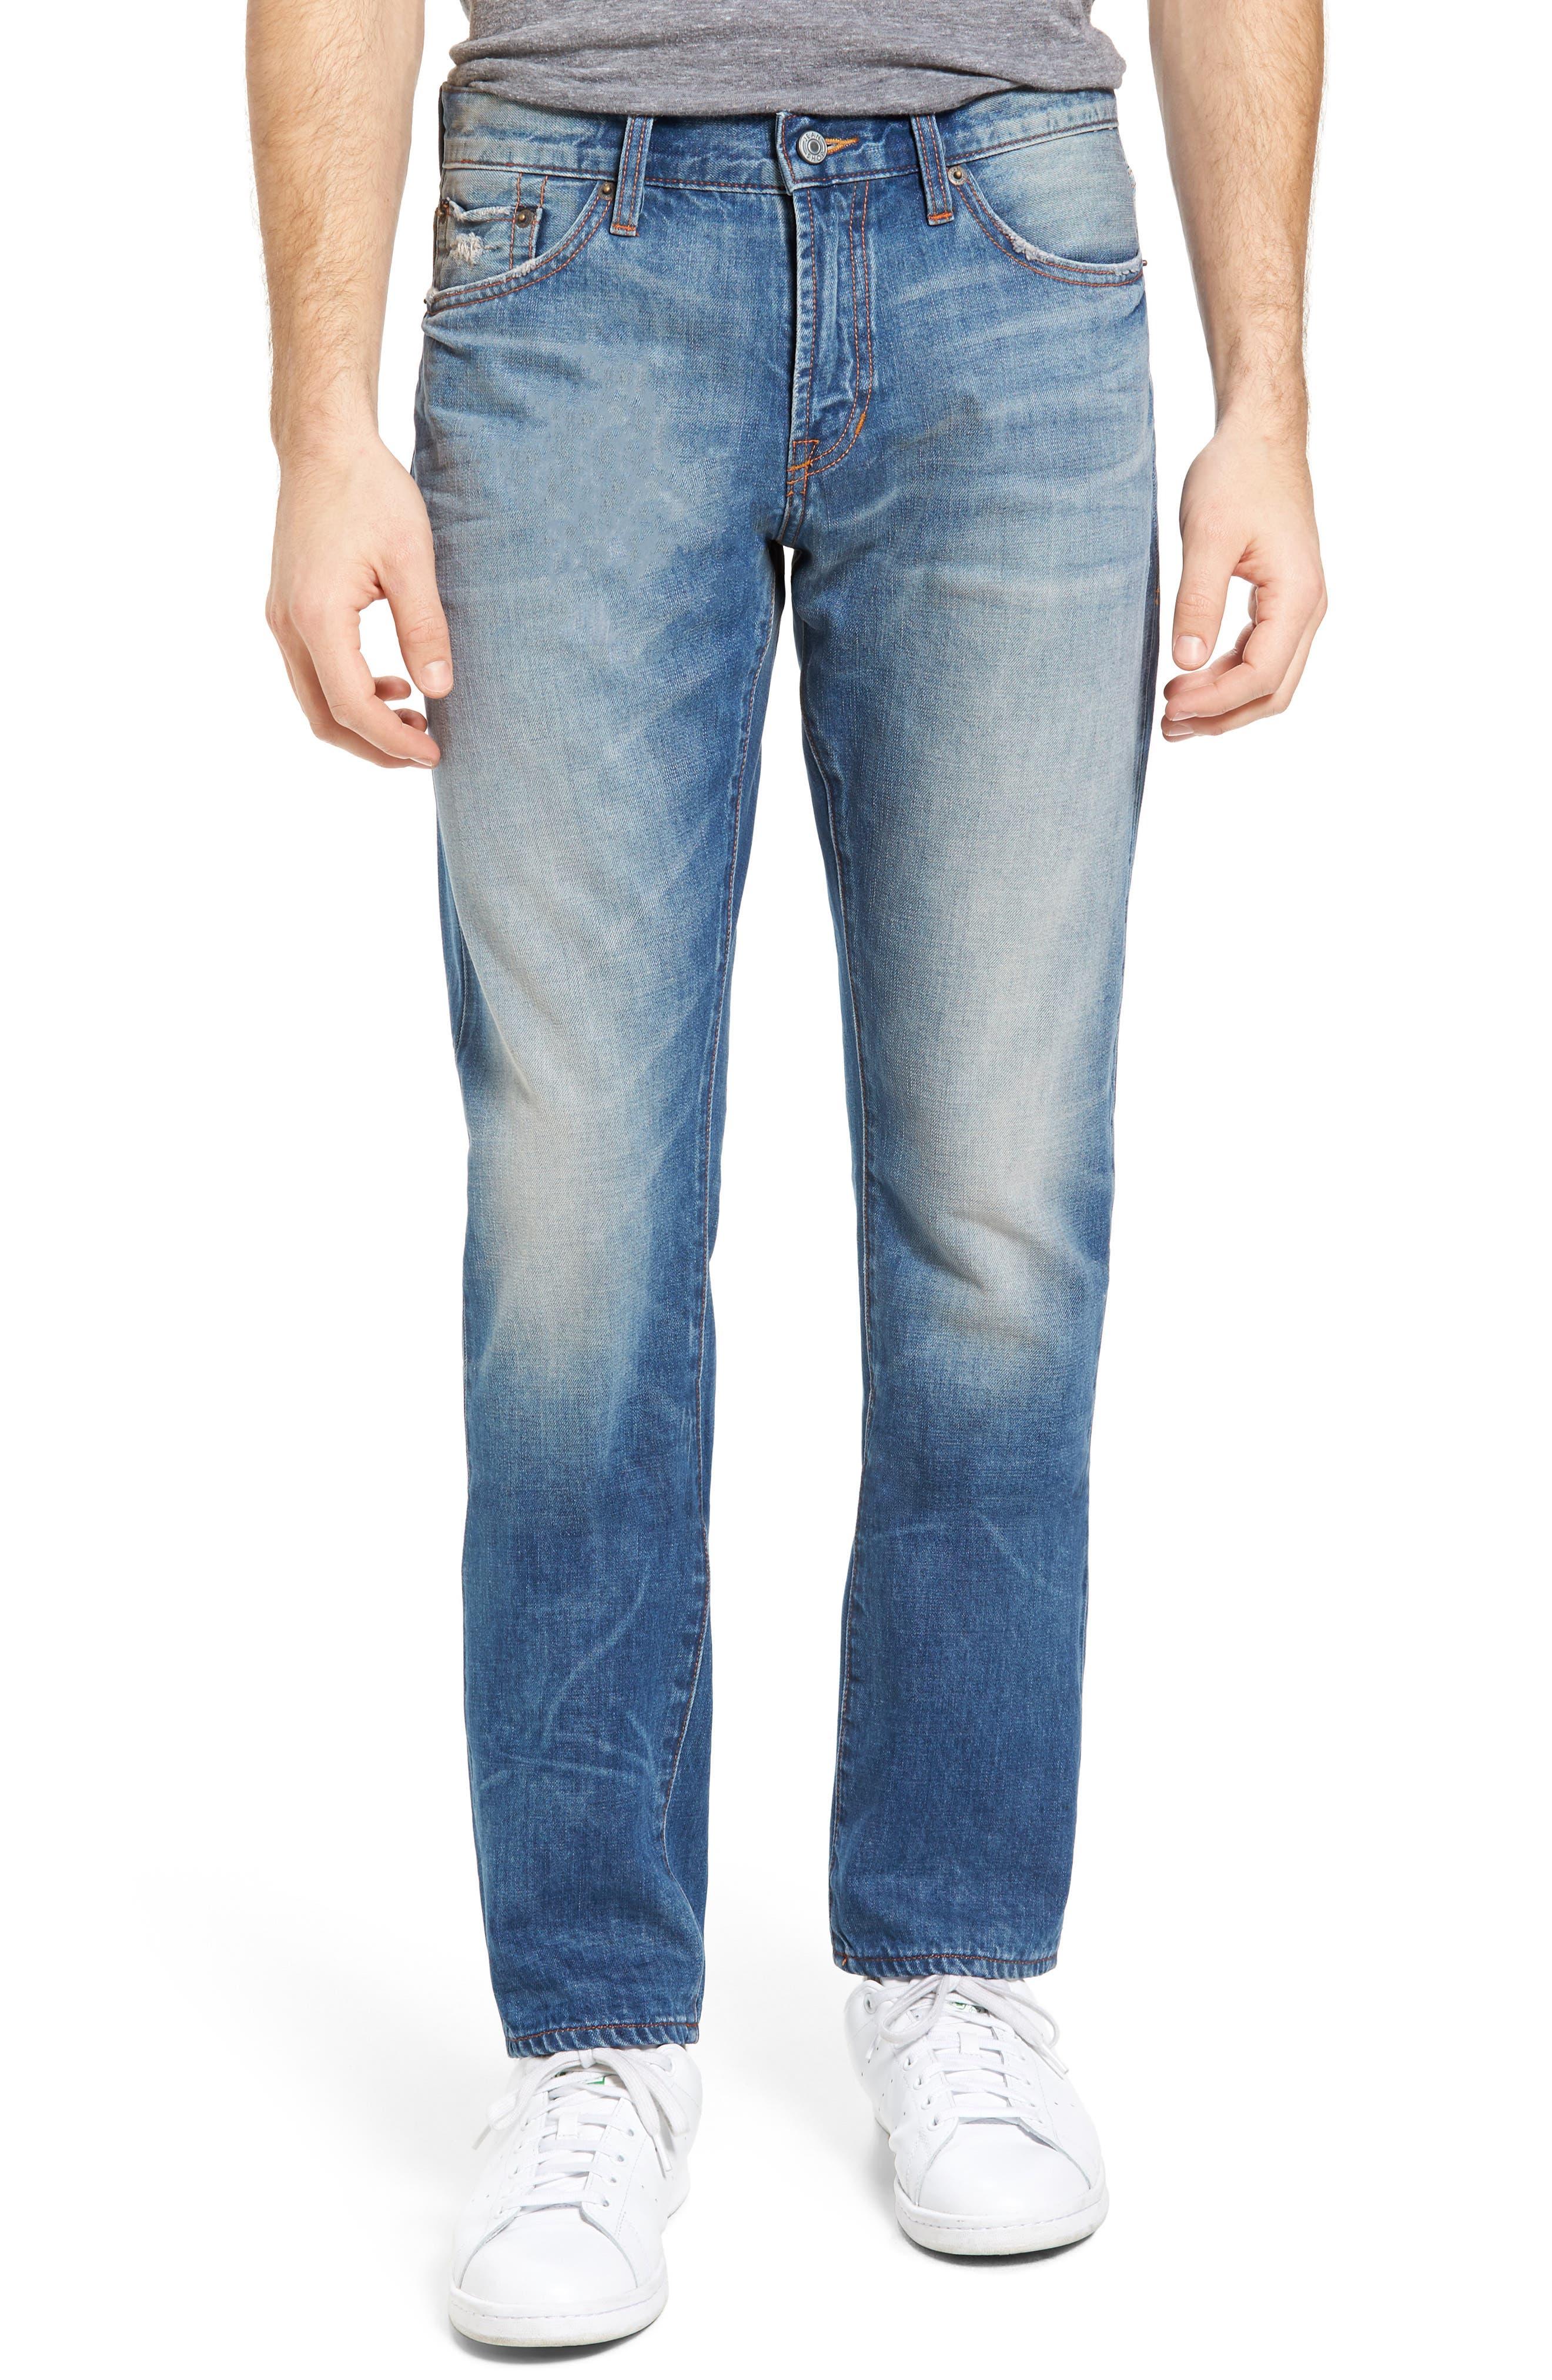 Jean Shop Slim Straight Leg Jeans (Spring Vintage)